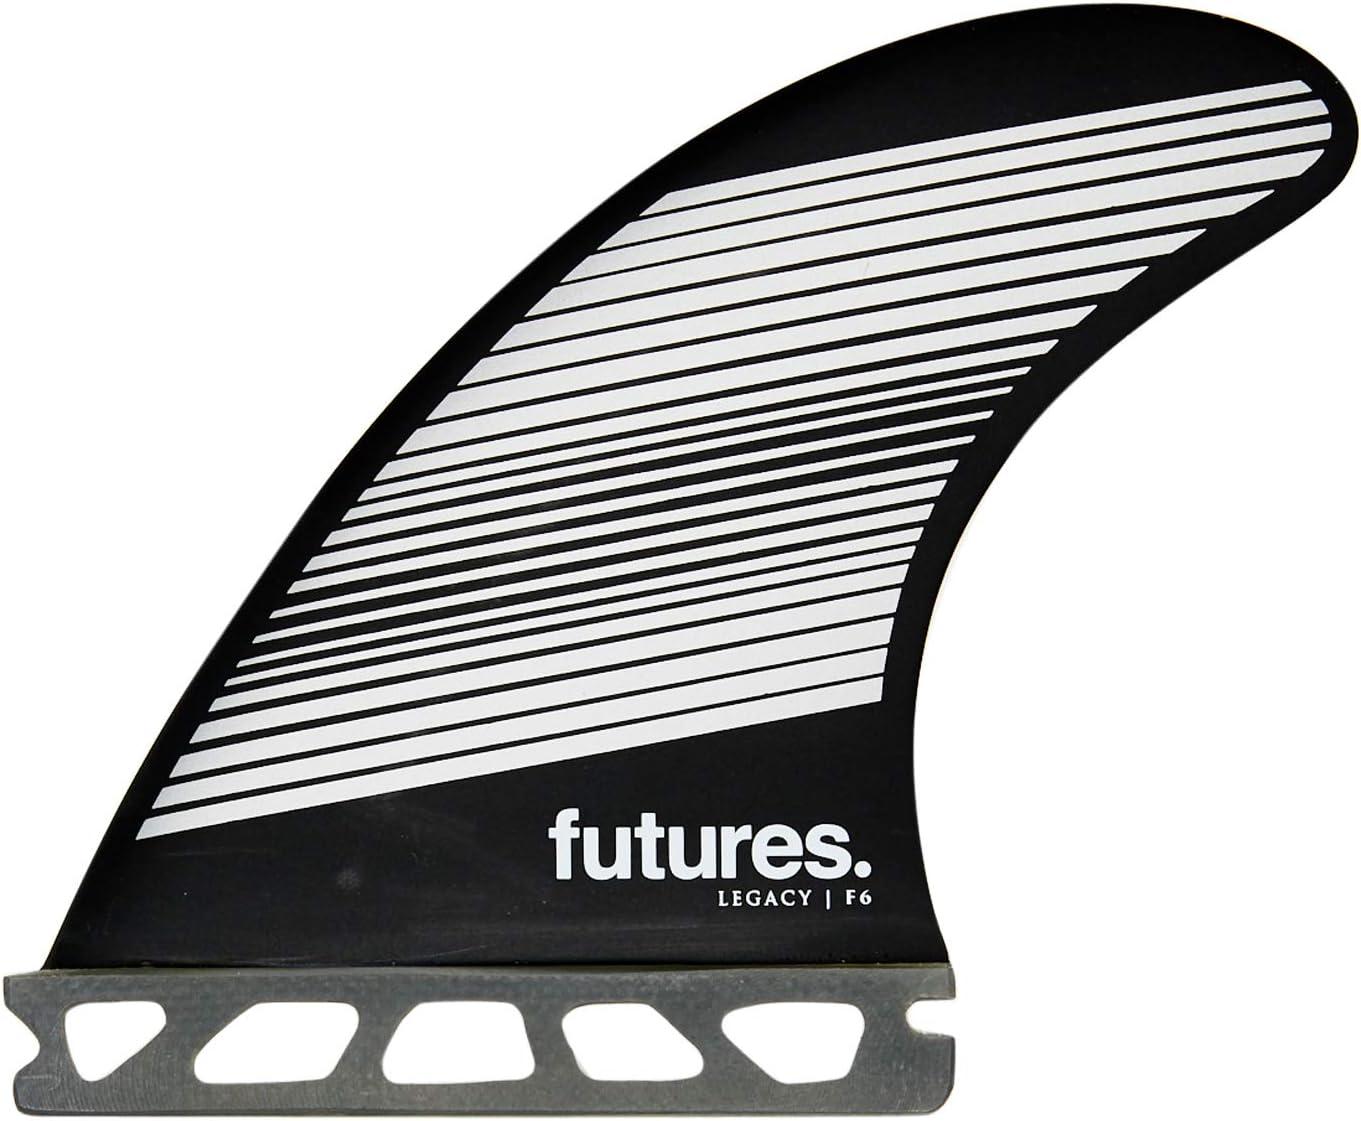 Futures F6 Surprise price Legacy Thruster Miami Mall Set Gray Fin Black